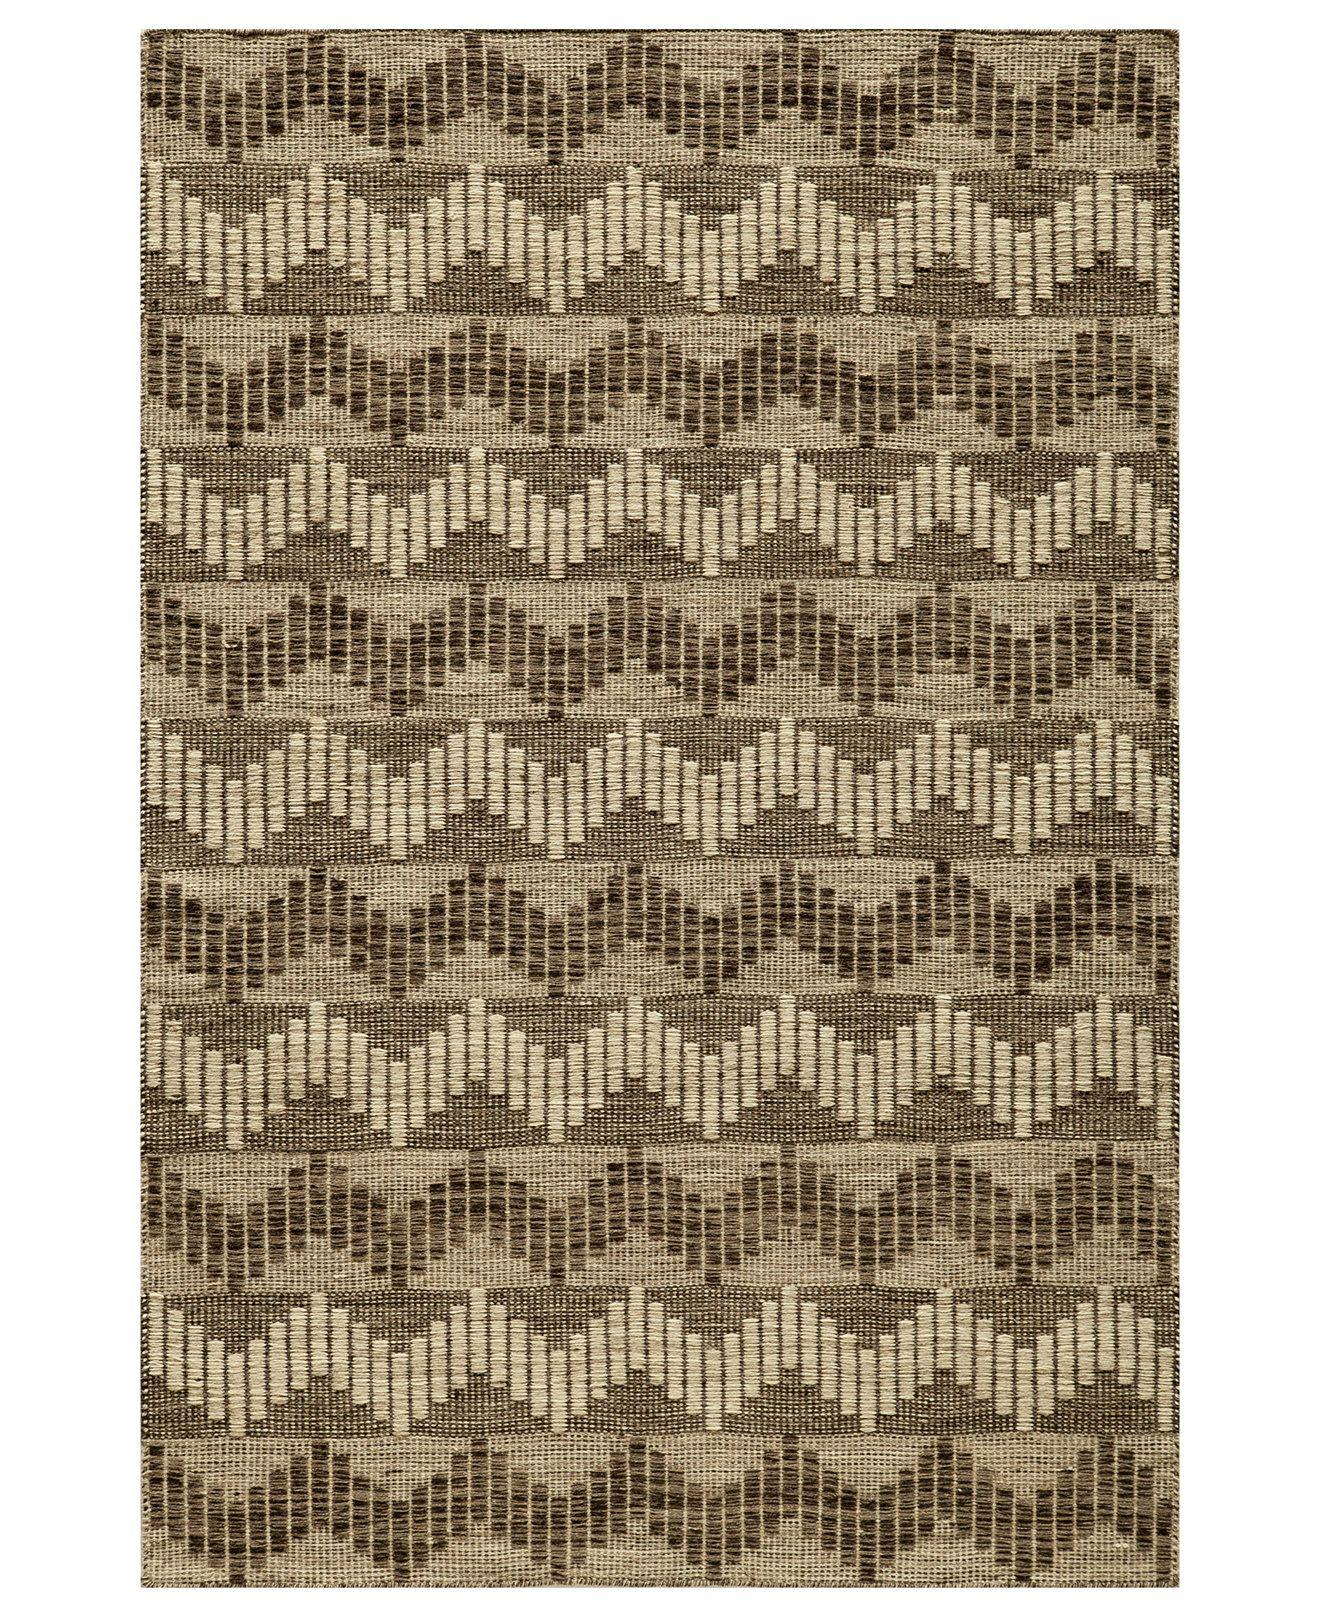 Momeni Area Rug, Keaton Flatweave Bar Grey 8' x 10' - 8 x 10 Rugs - Rugs - Macy's